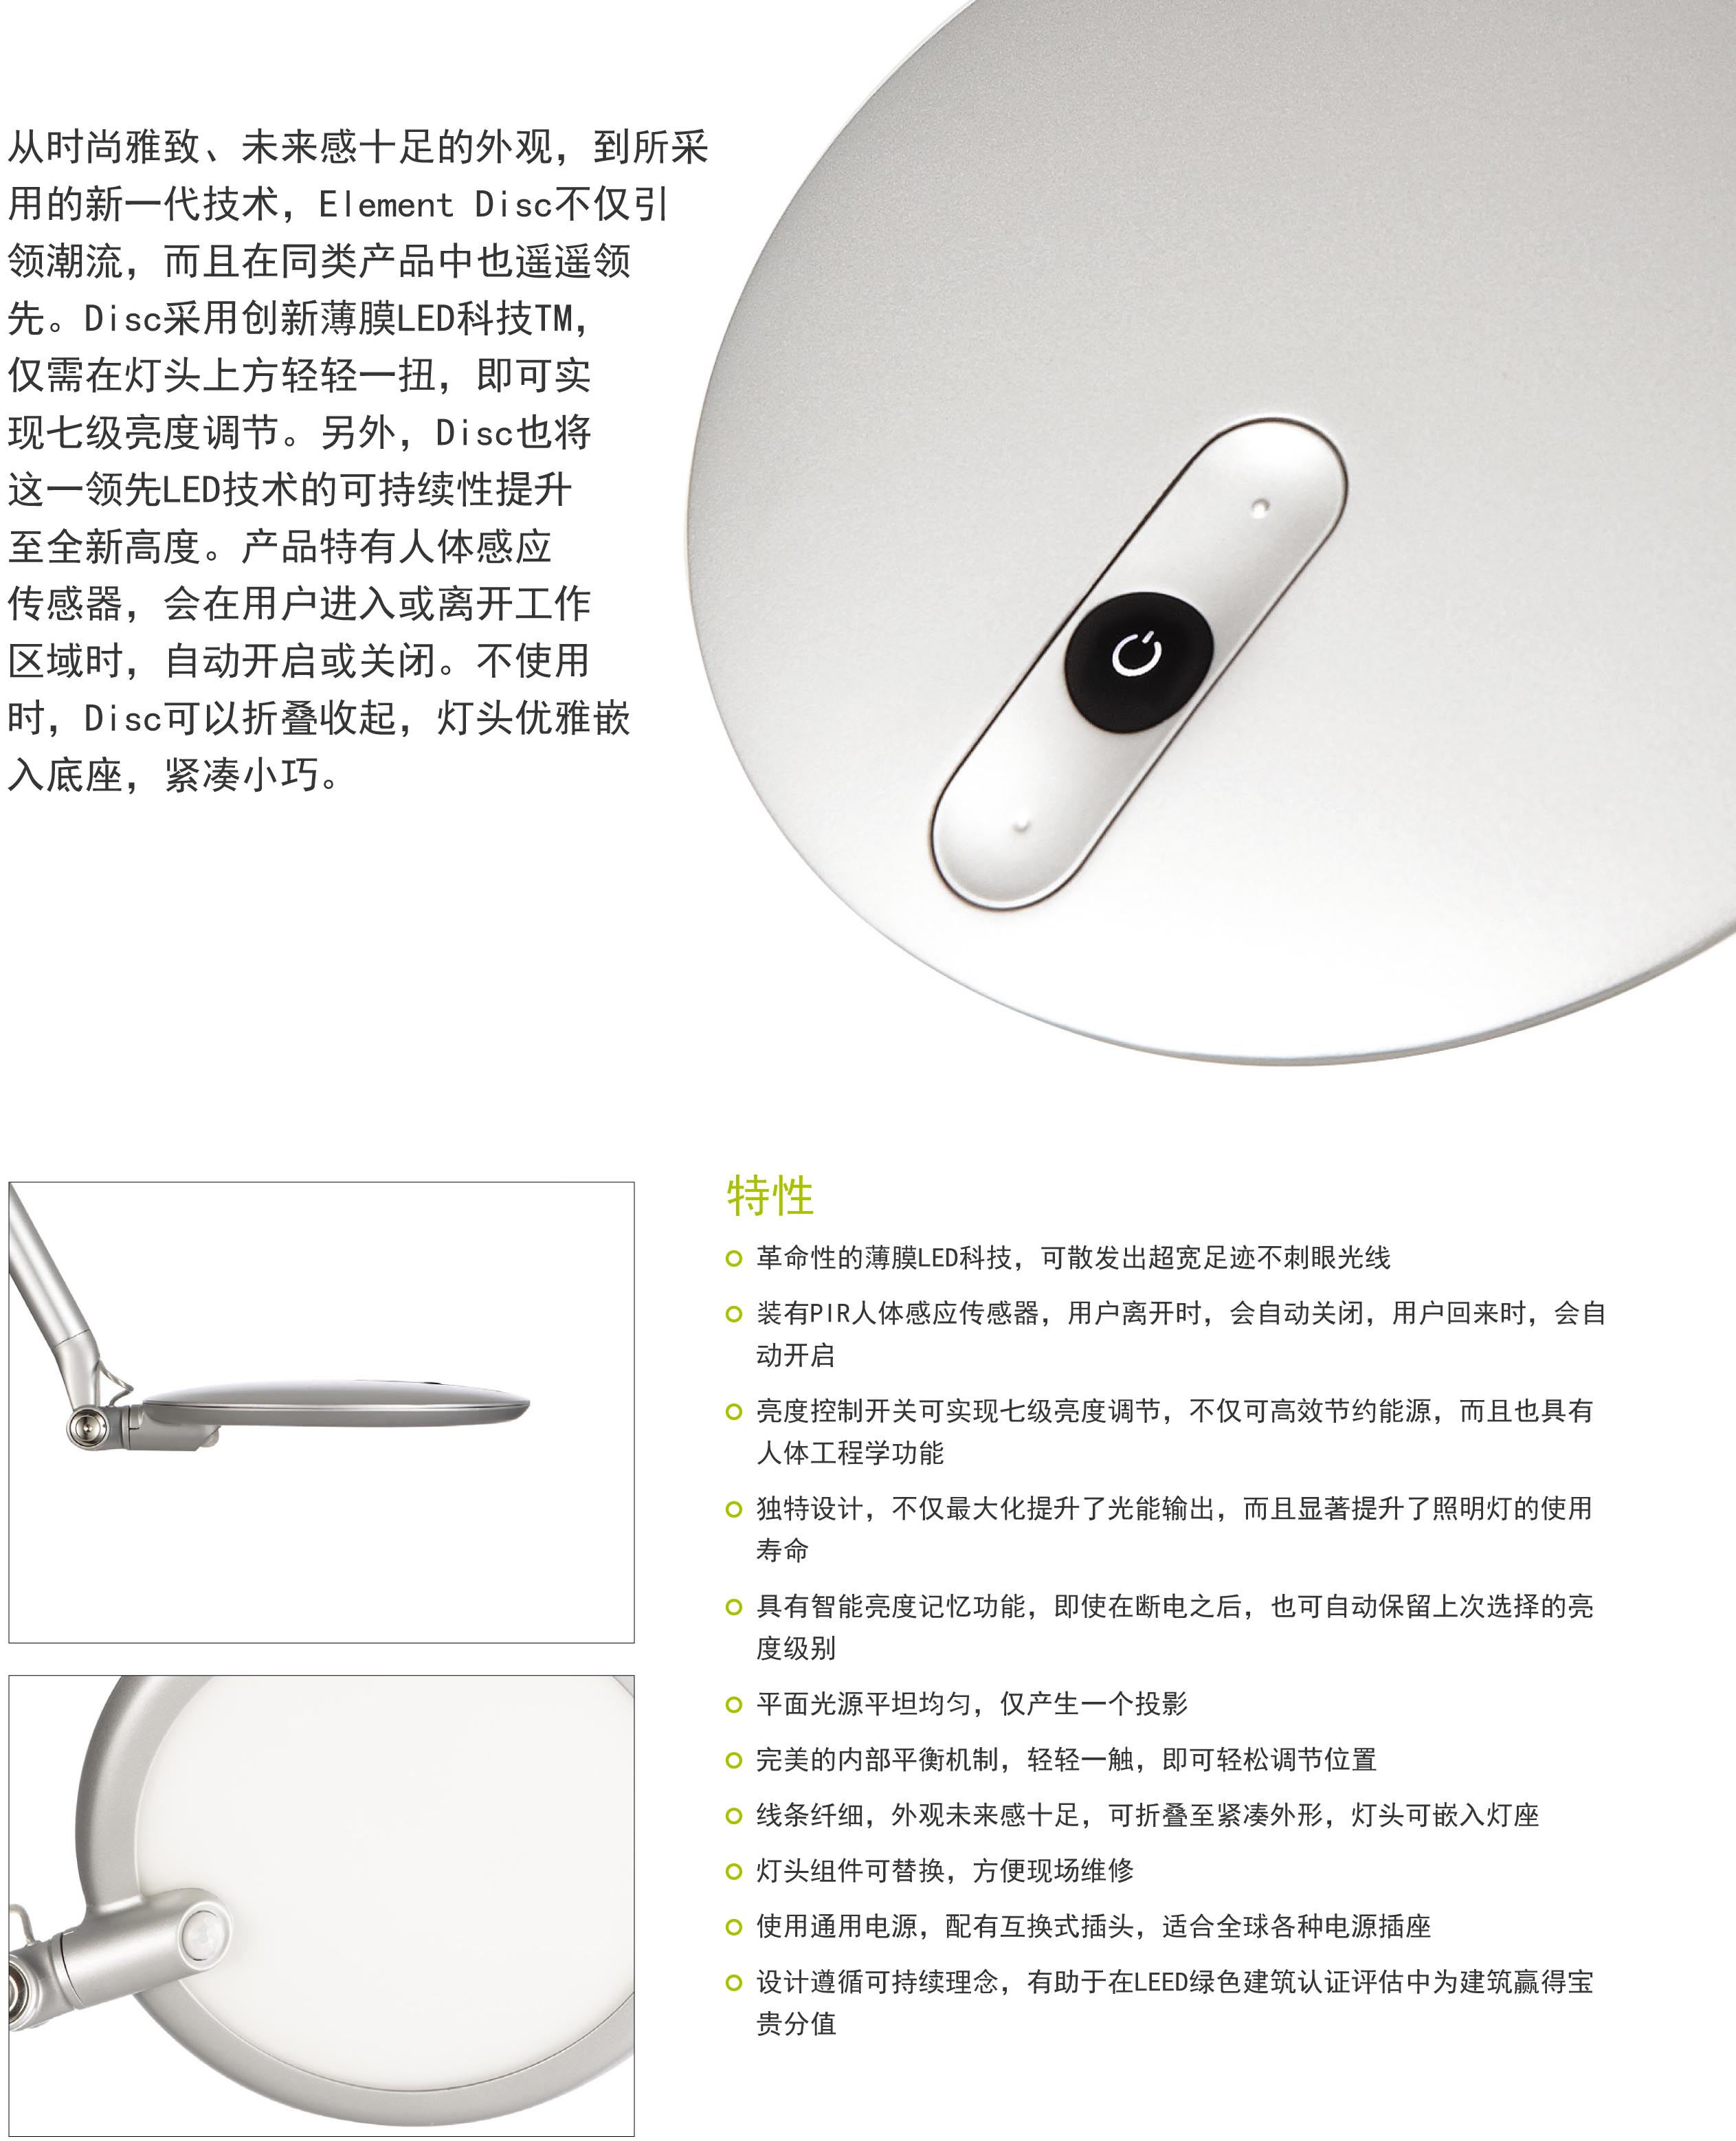 9Element Disc-2.jpg